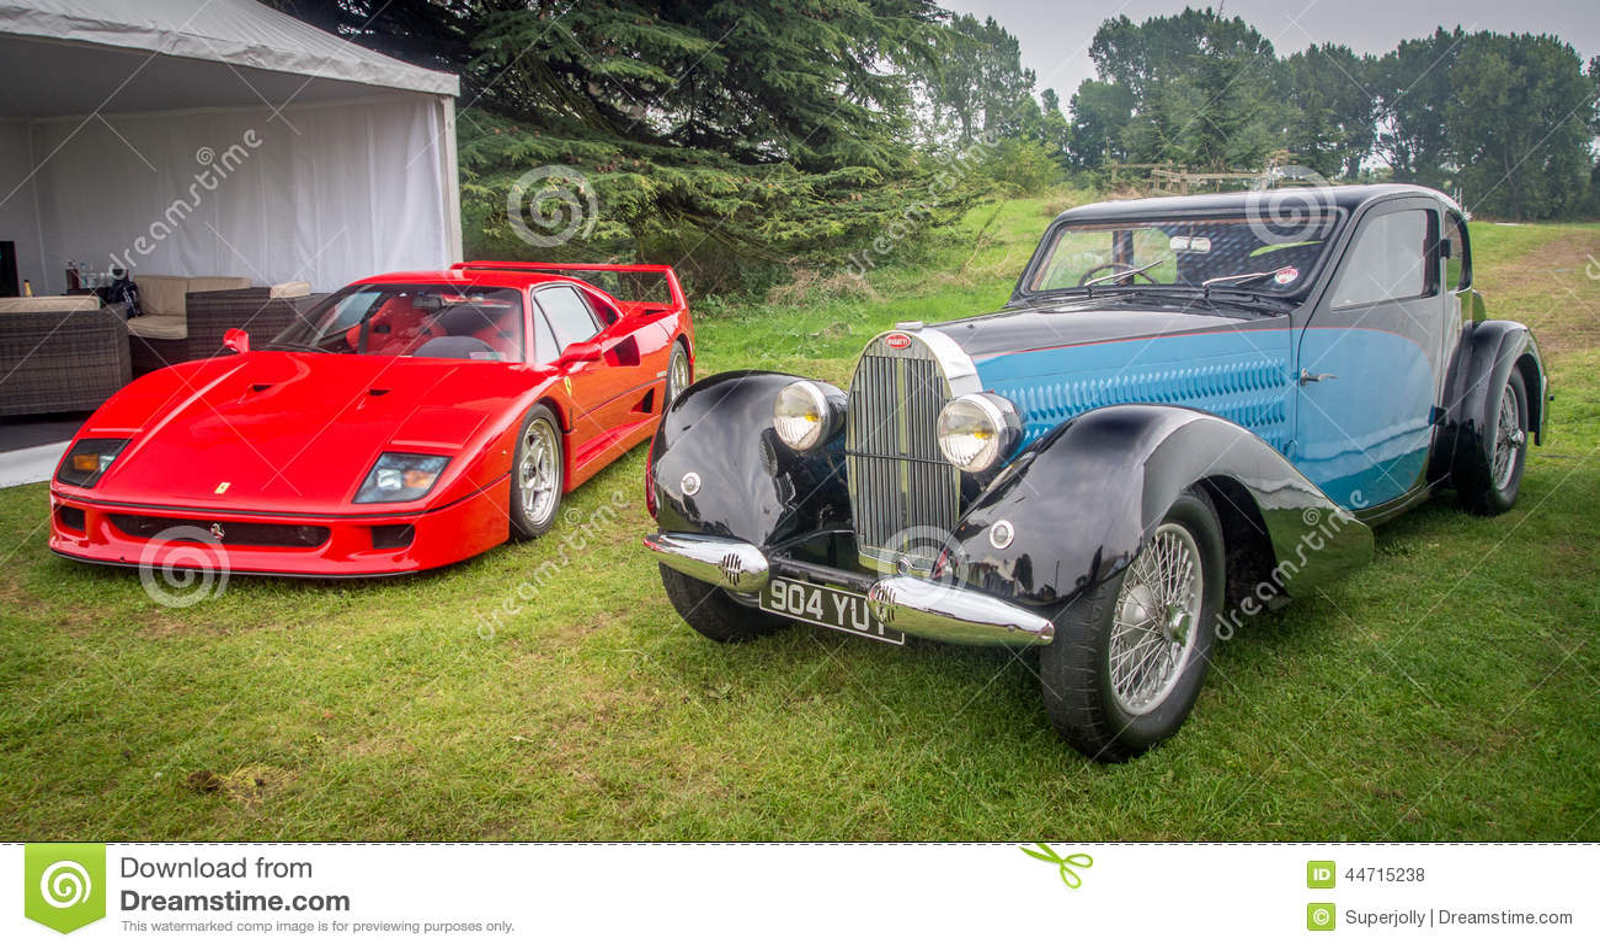 Syon Park, London Salon Prive Super Sports Motor Car Show Ferarri ...